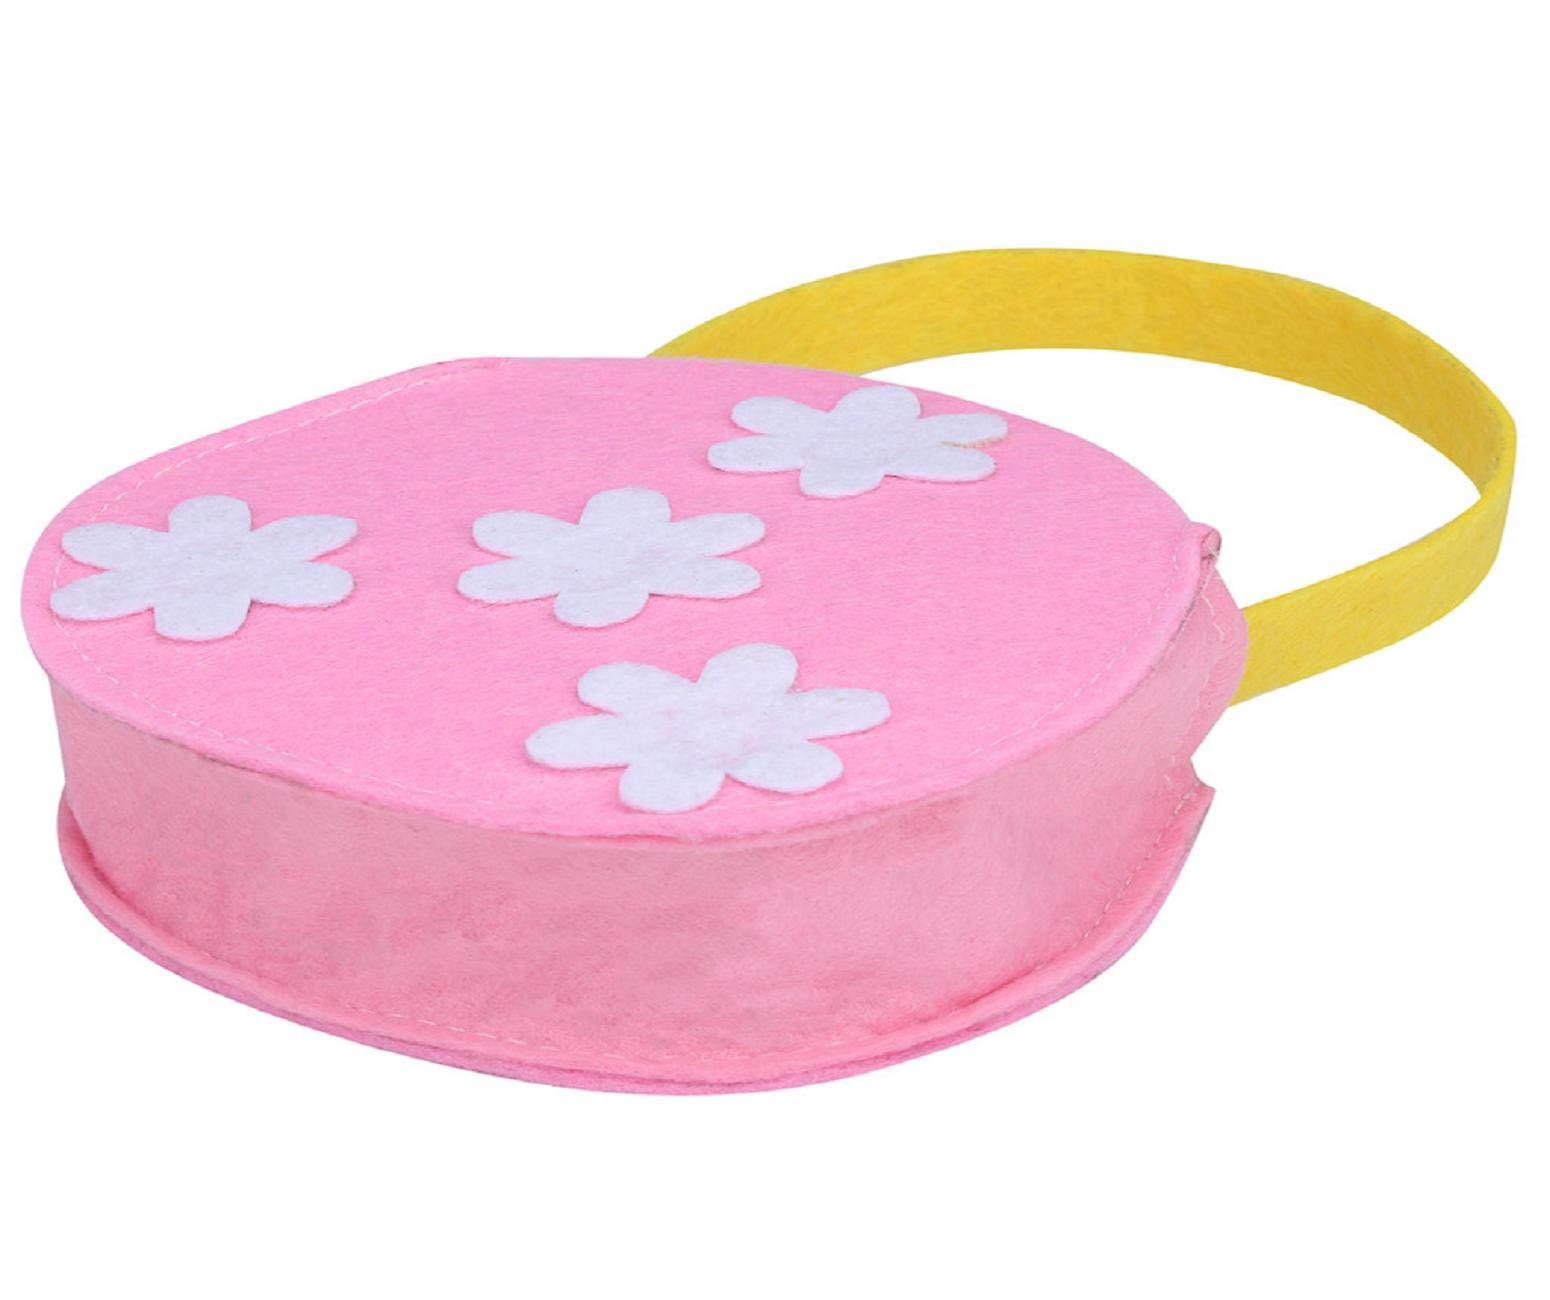 Vertily Easter Bag,Easter Small Flower Gift Bag Candy Bag Creative Present Home Accessory Easter Basket Tote Handbag Blank Bag